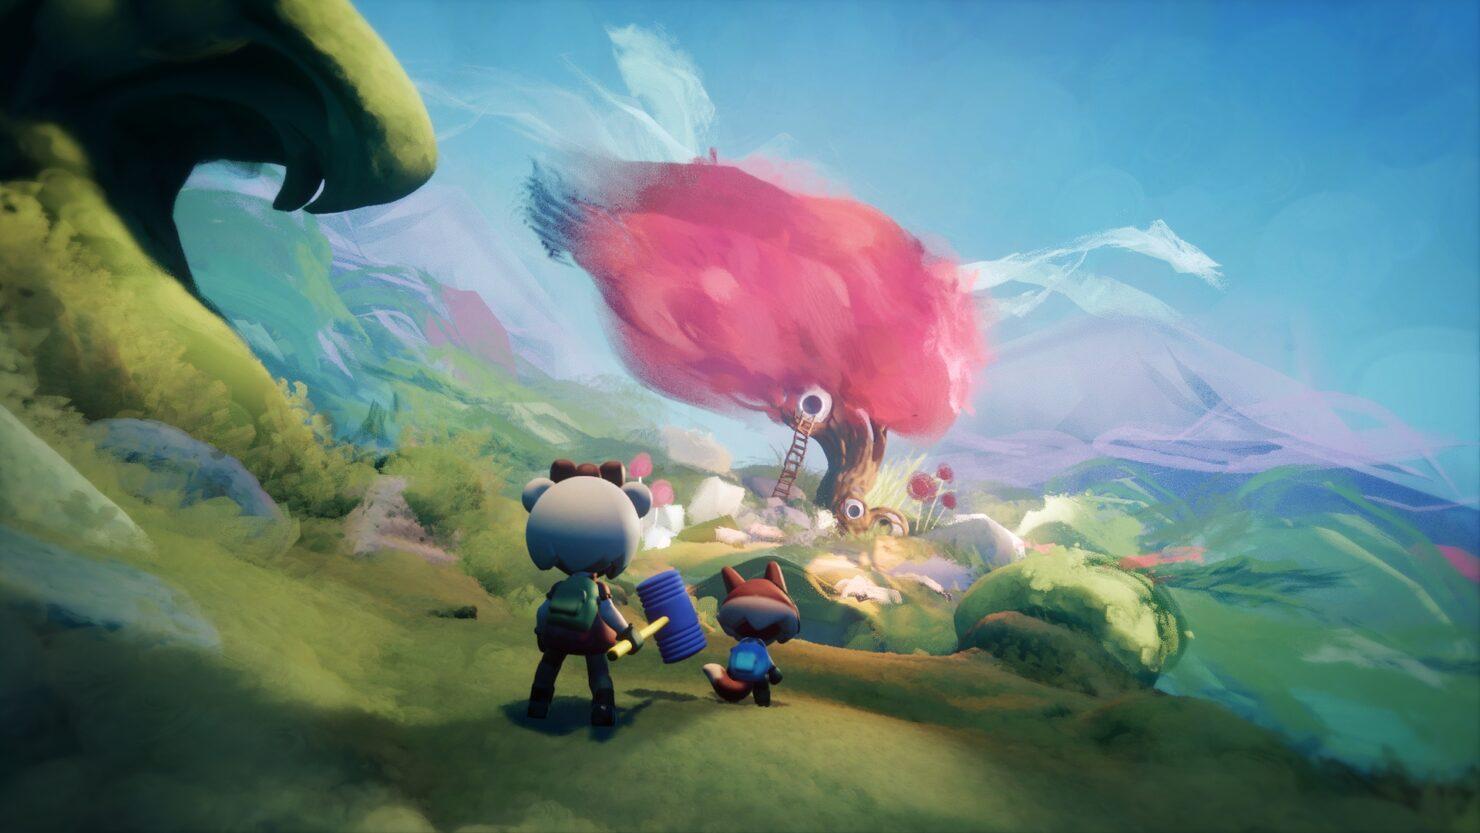 dreams-ps4-psx17-screenshot-07-childhood